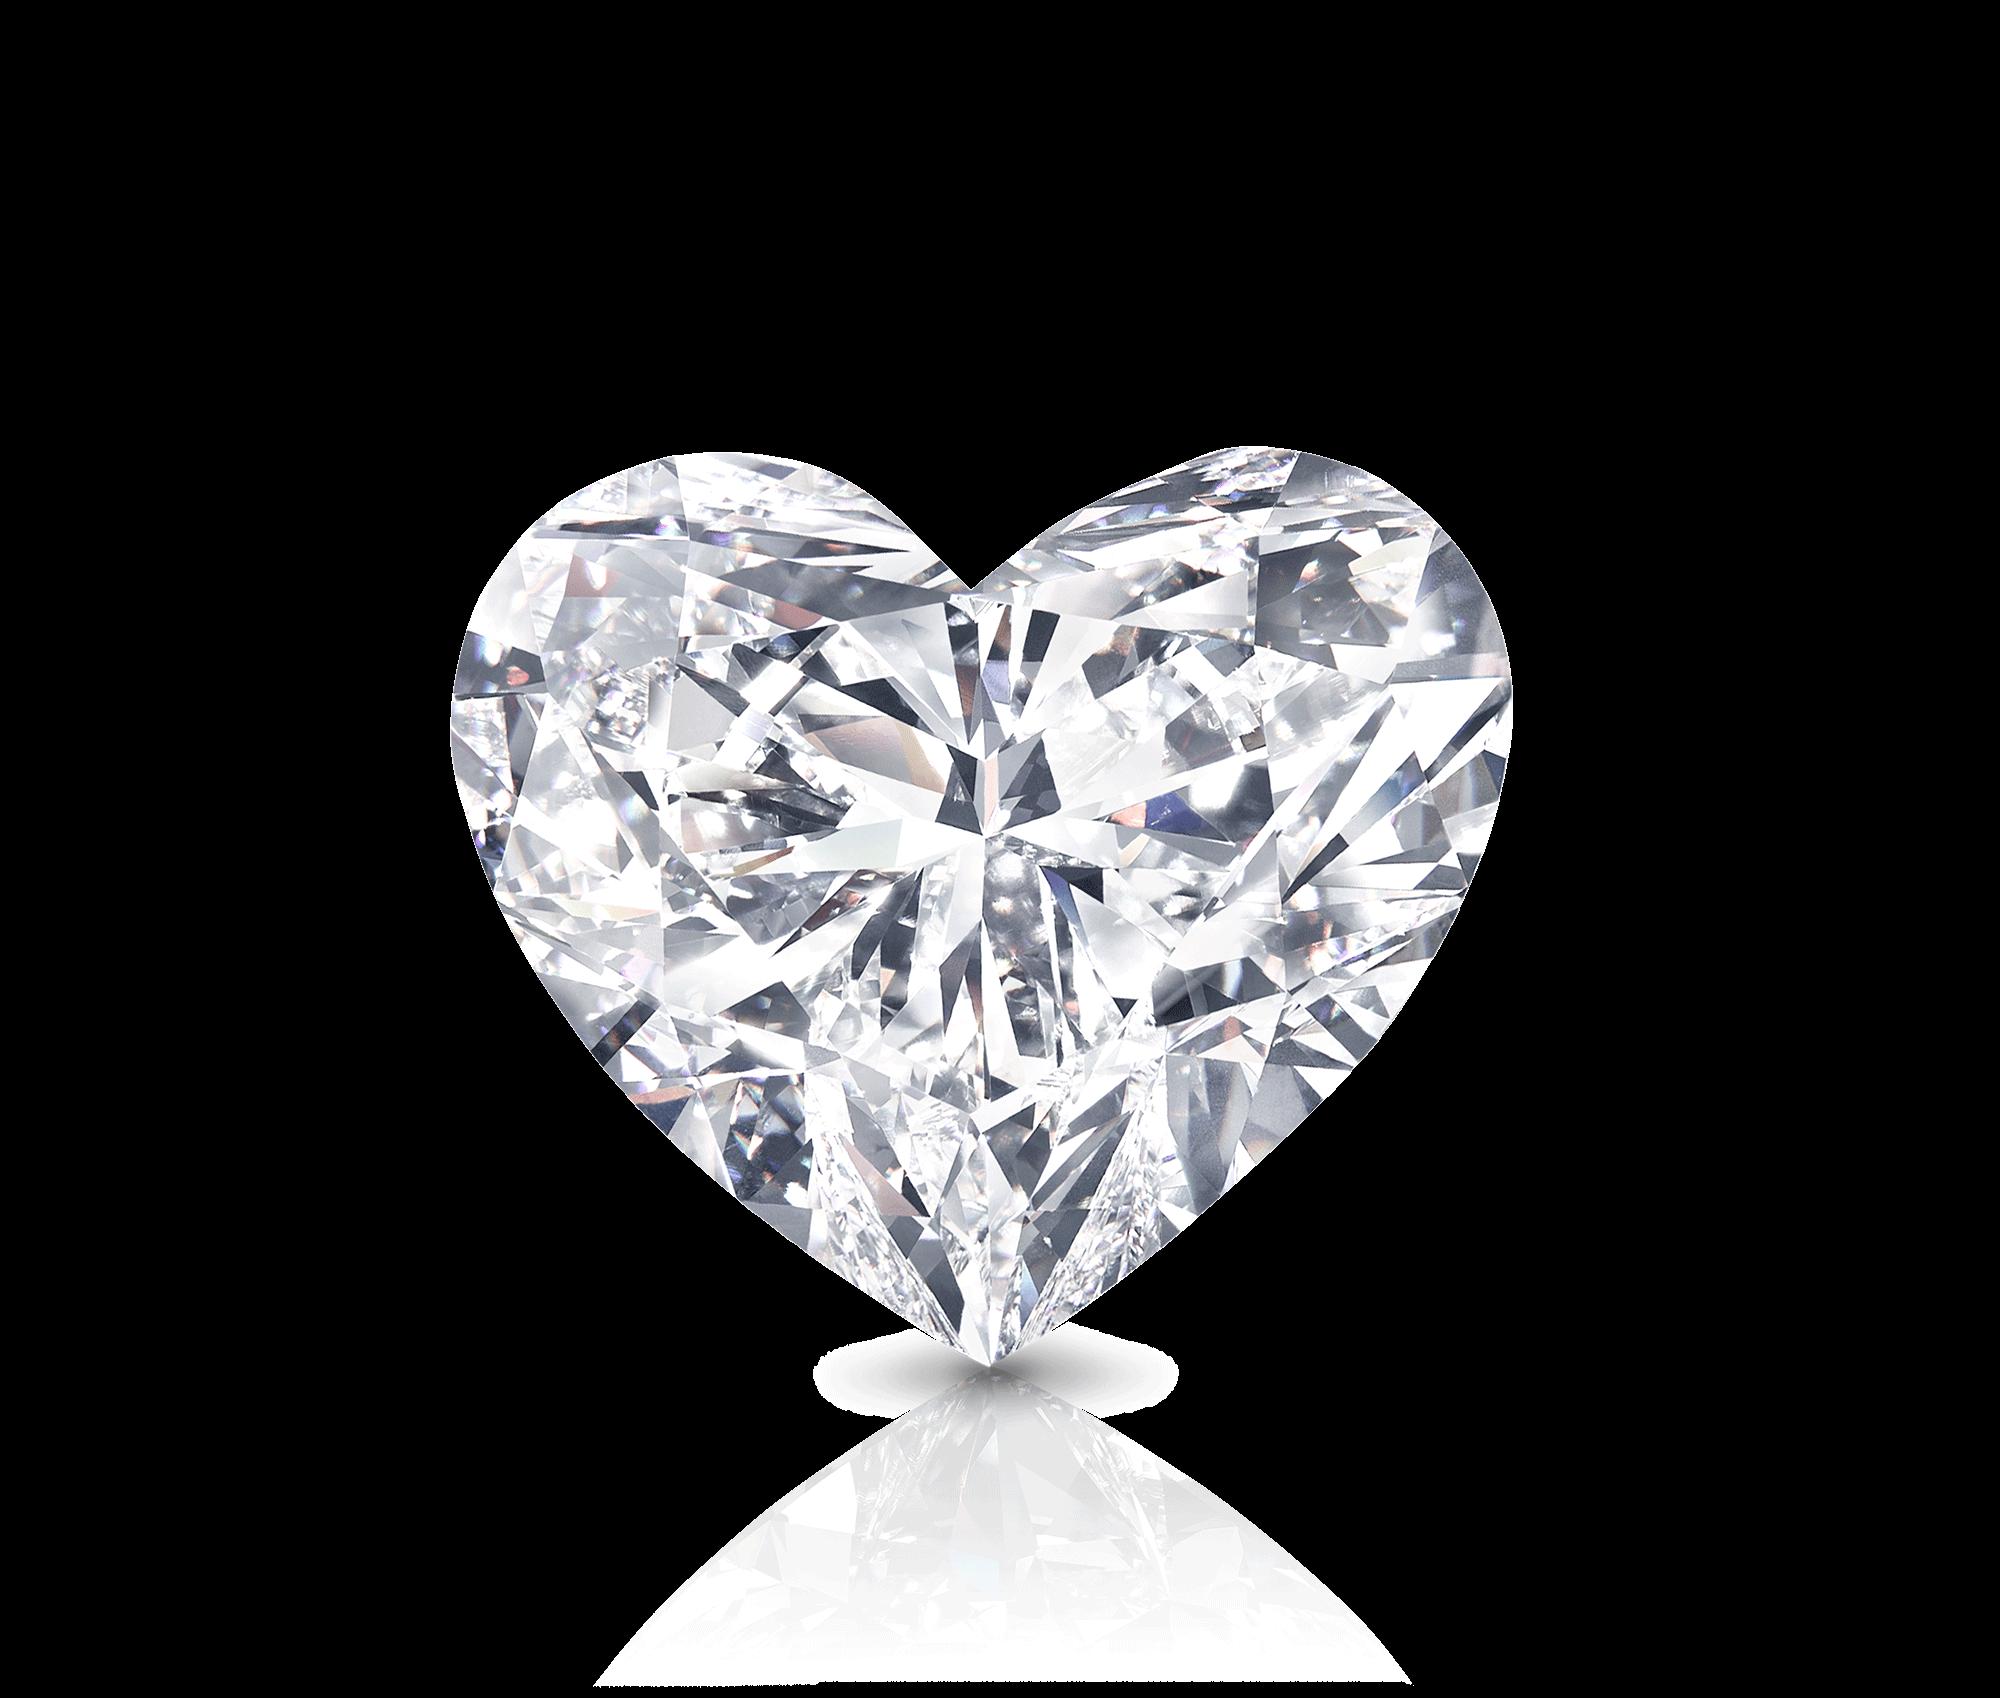 The Graff Venus - a heart shape white diamond